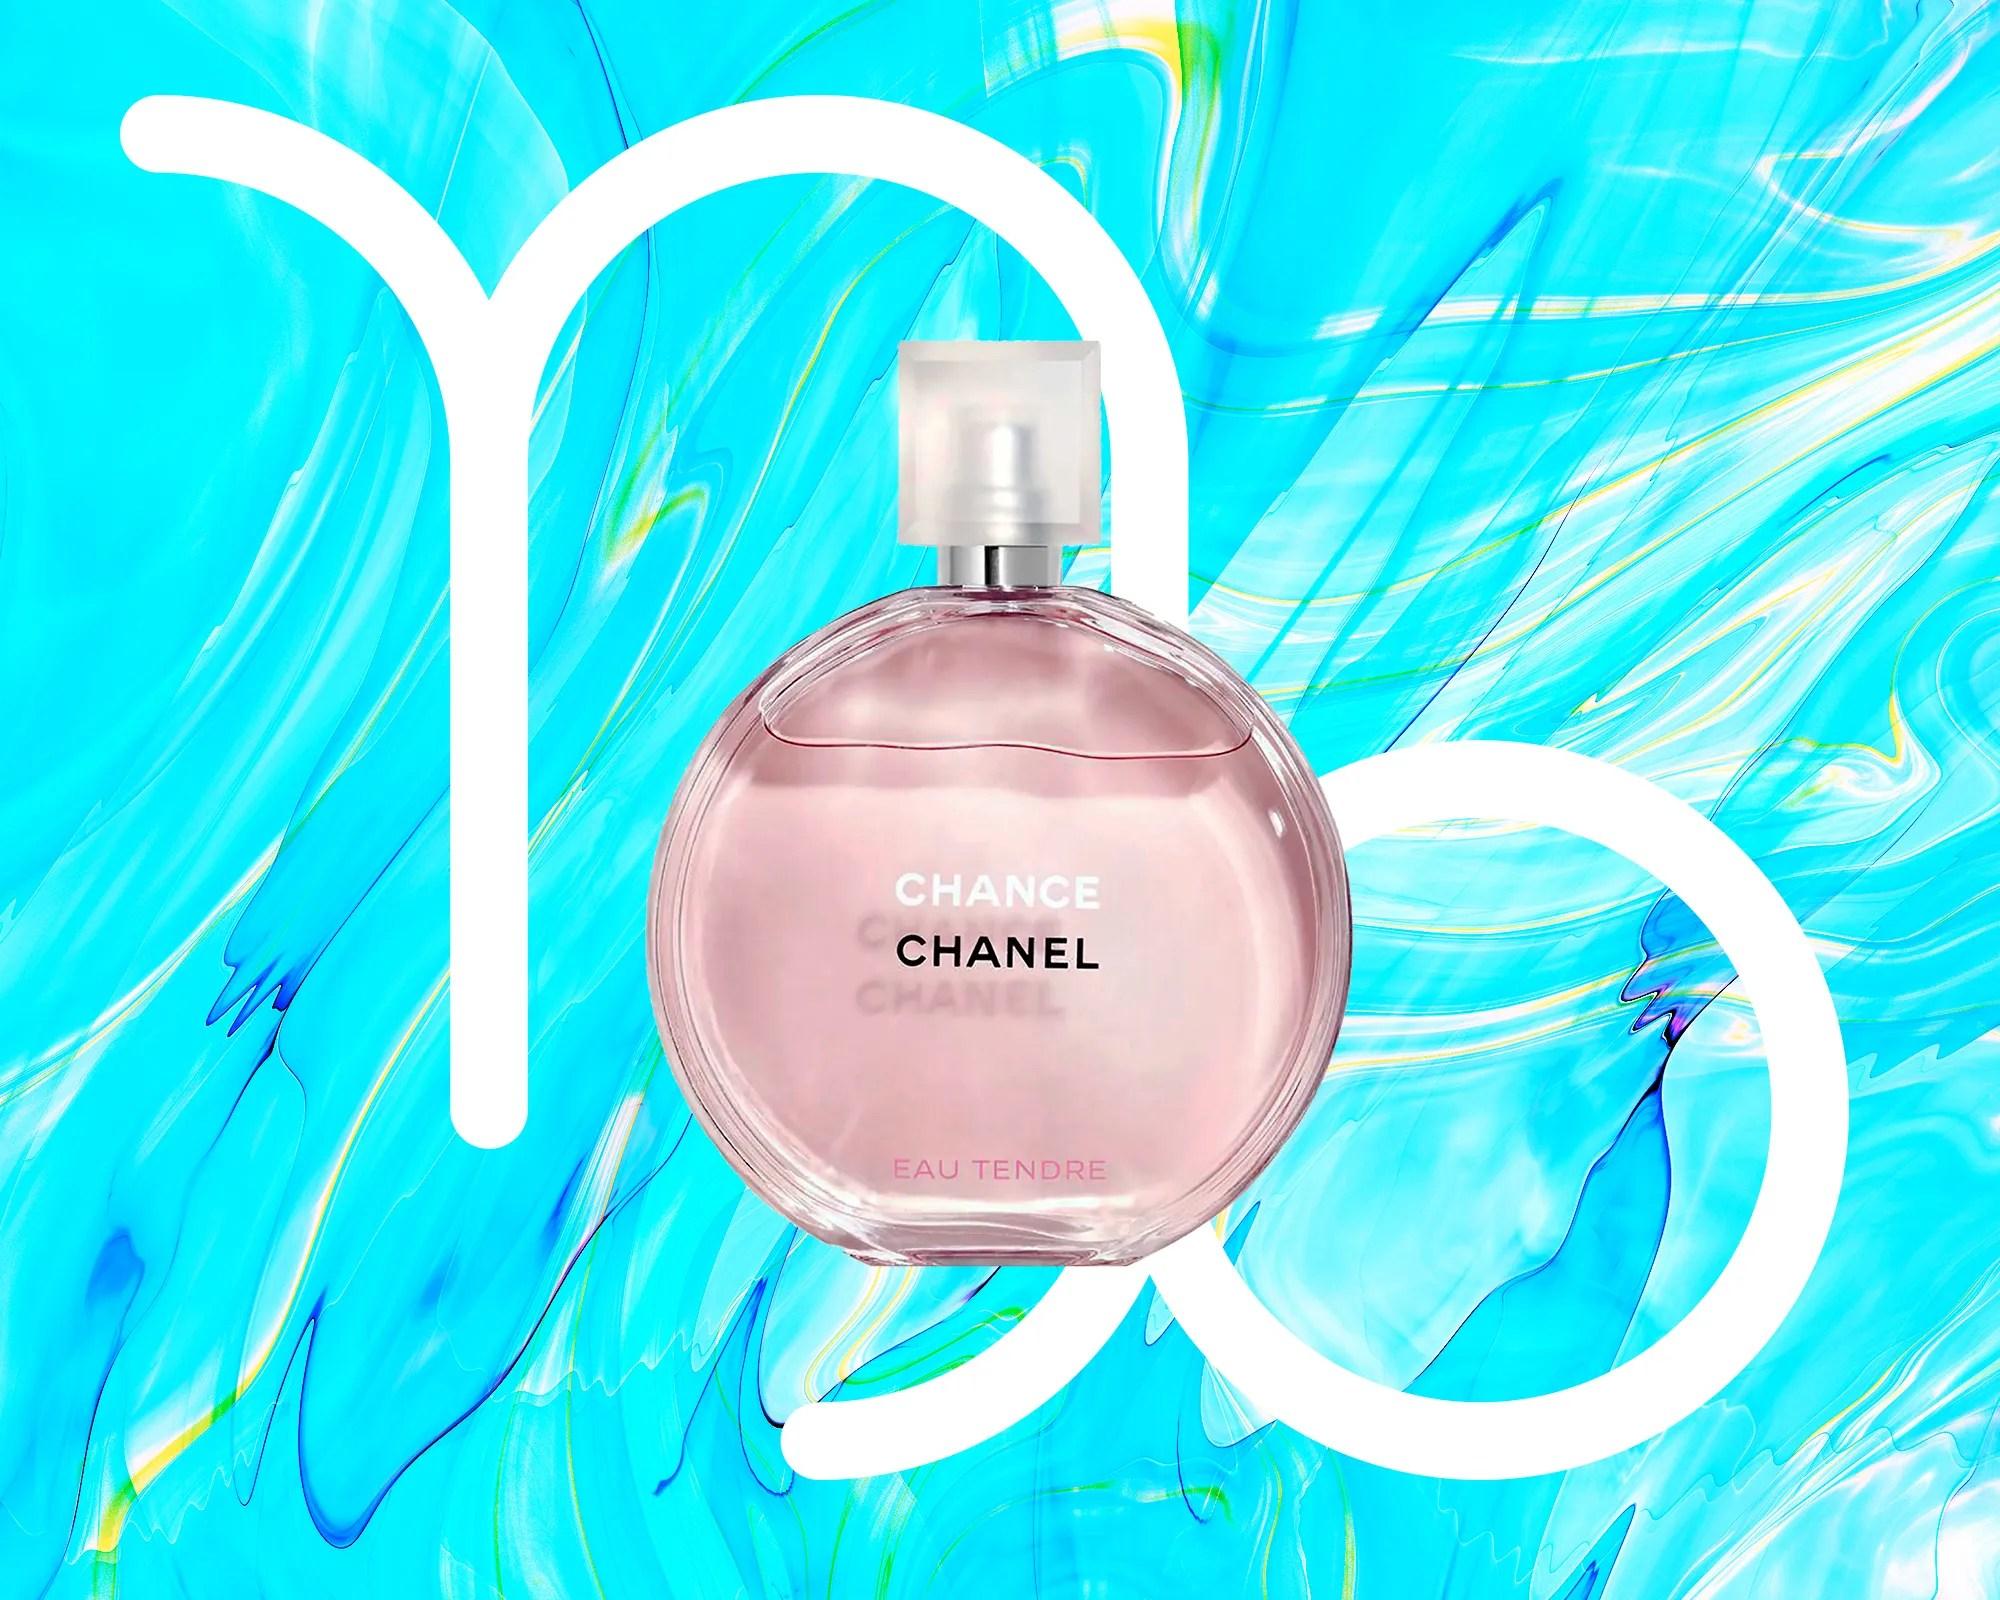 Chanel Likelihood Eau Tendre on a colourful designed background